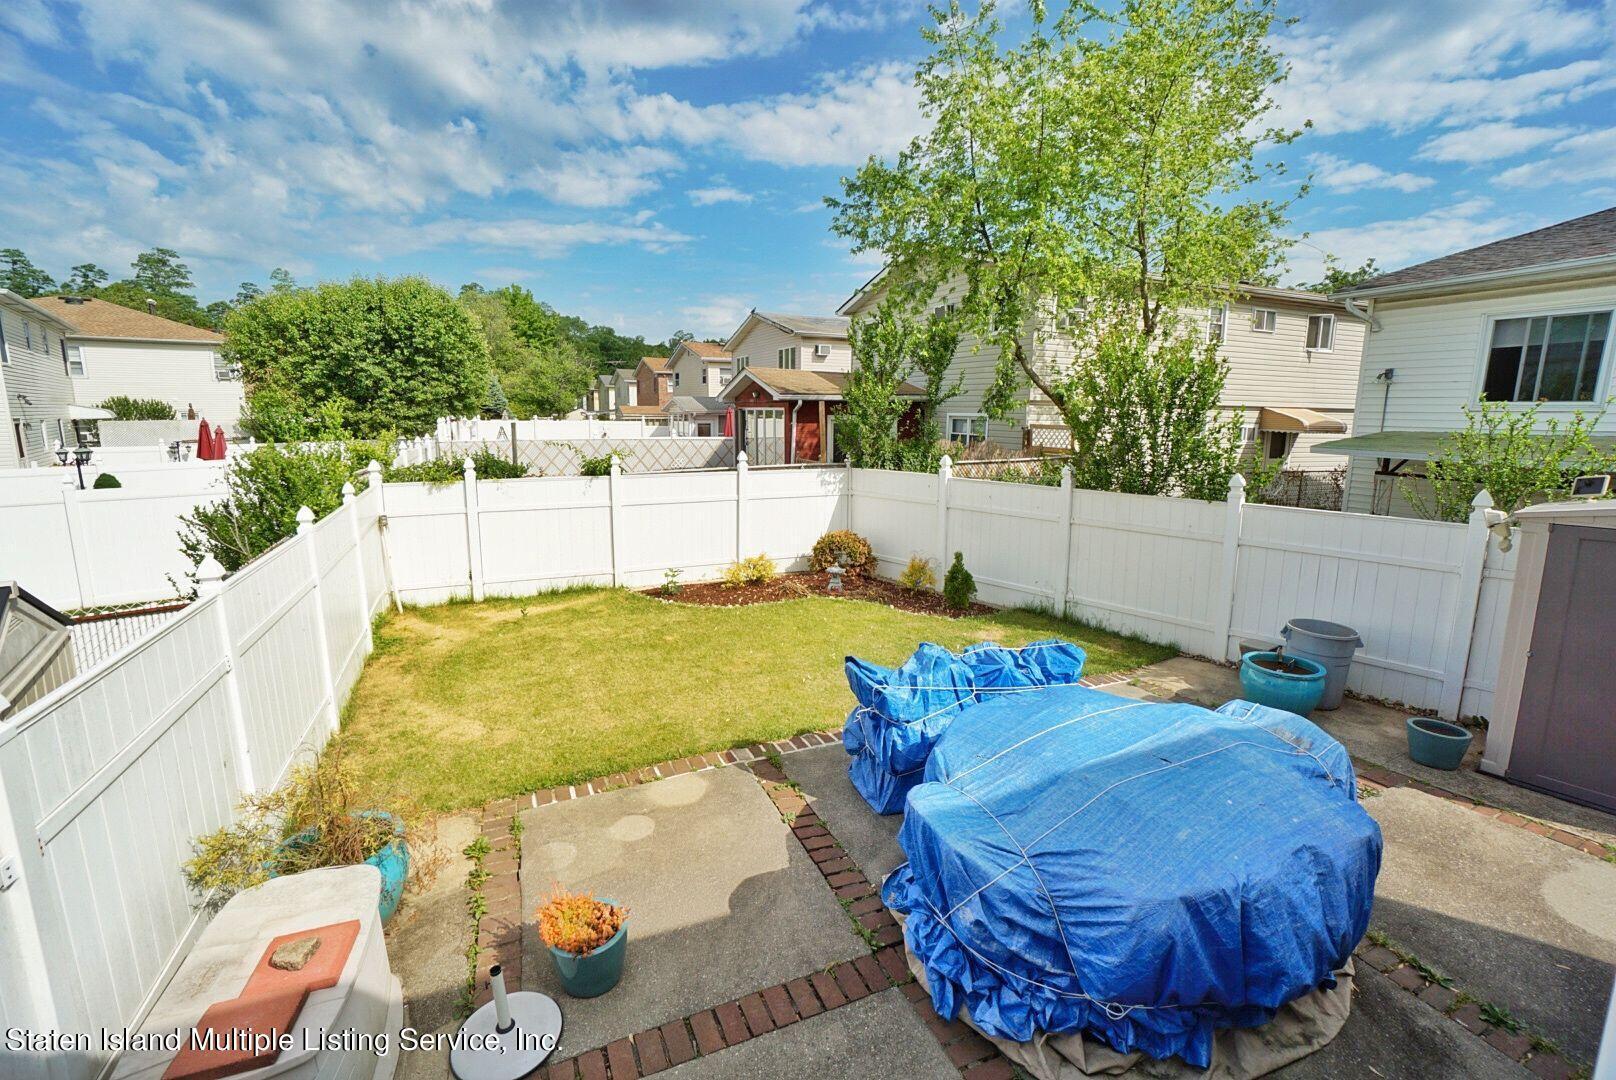 Single Family - Detached 94 Cranford Avenue  Staten Island, NY 10306, MLS-1146620-45